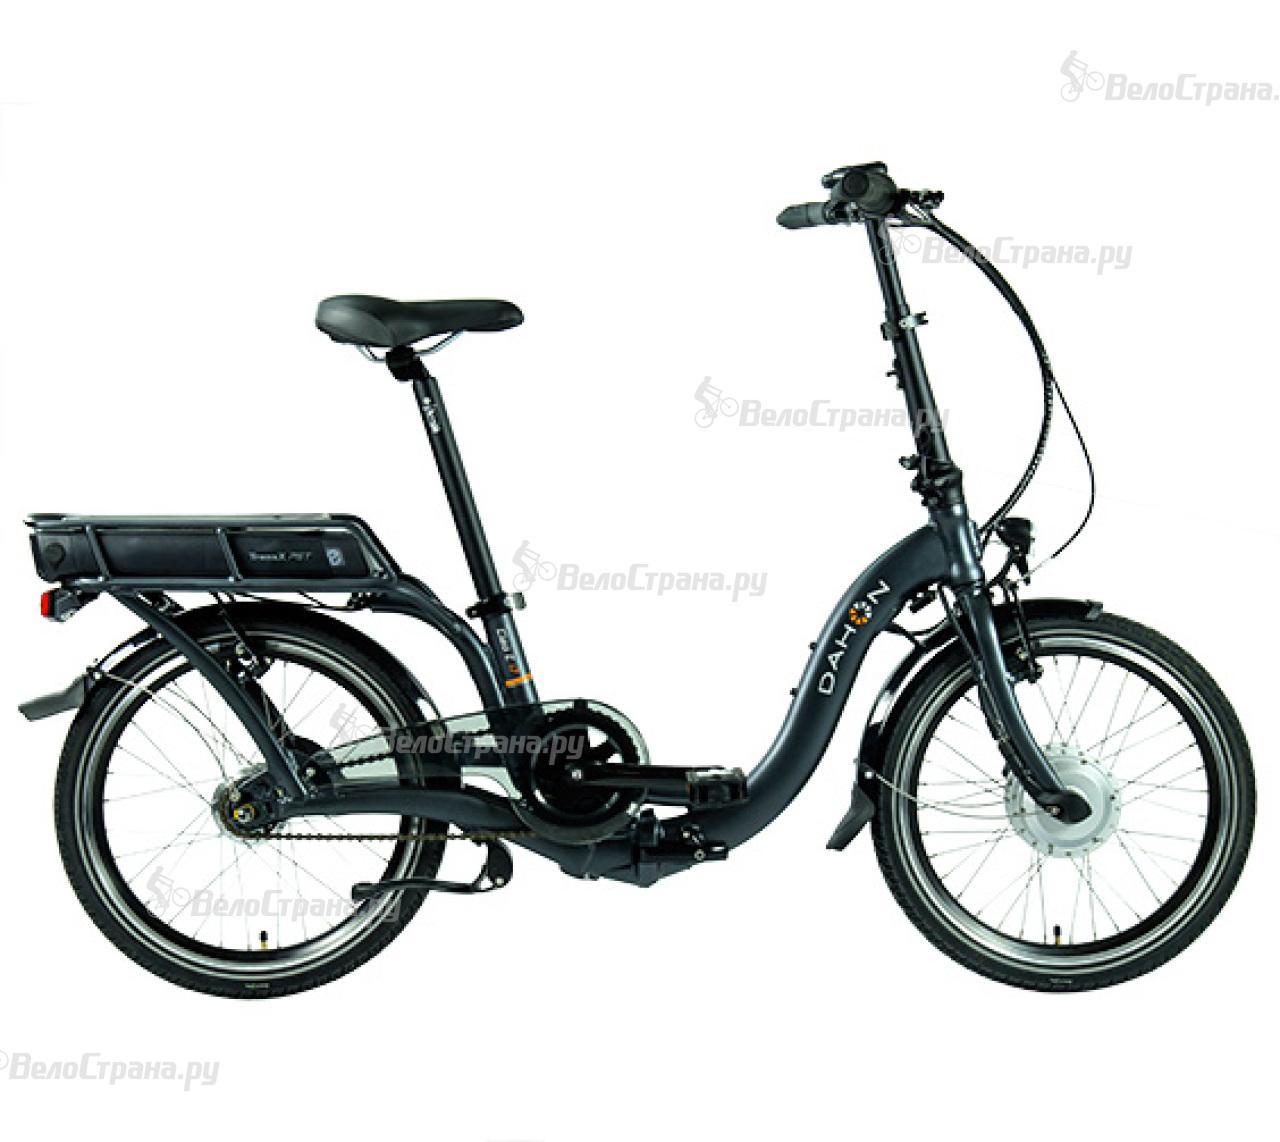 Велосипед Dahon Ciao E i7 (2017) велосипед dahon ciao d7 2014